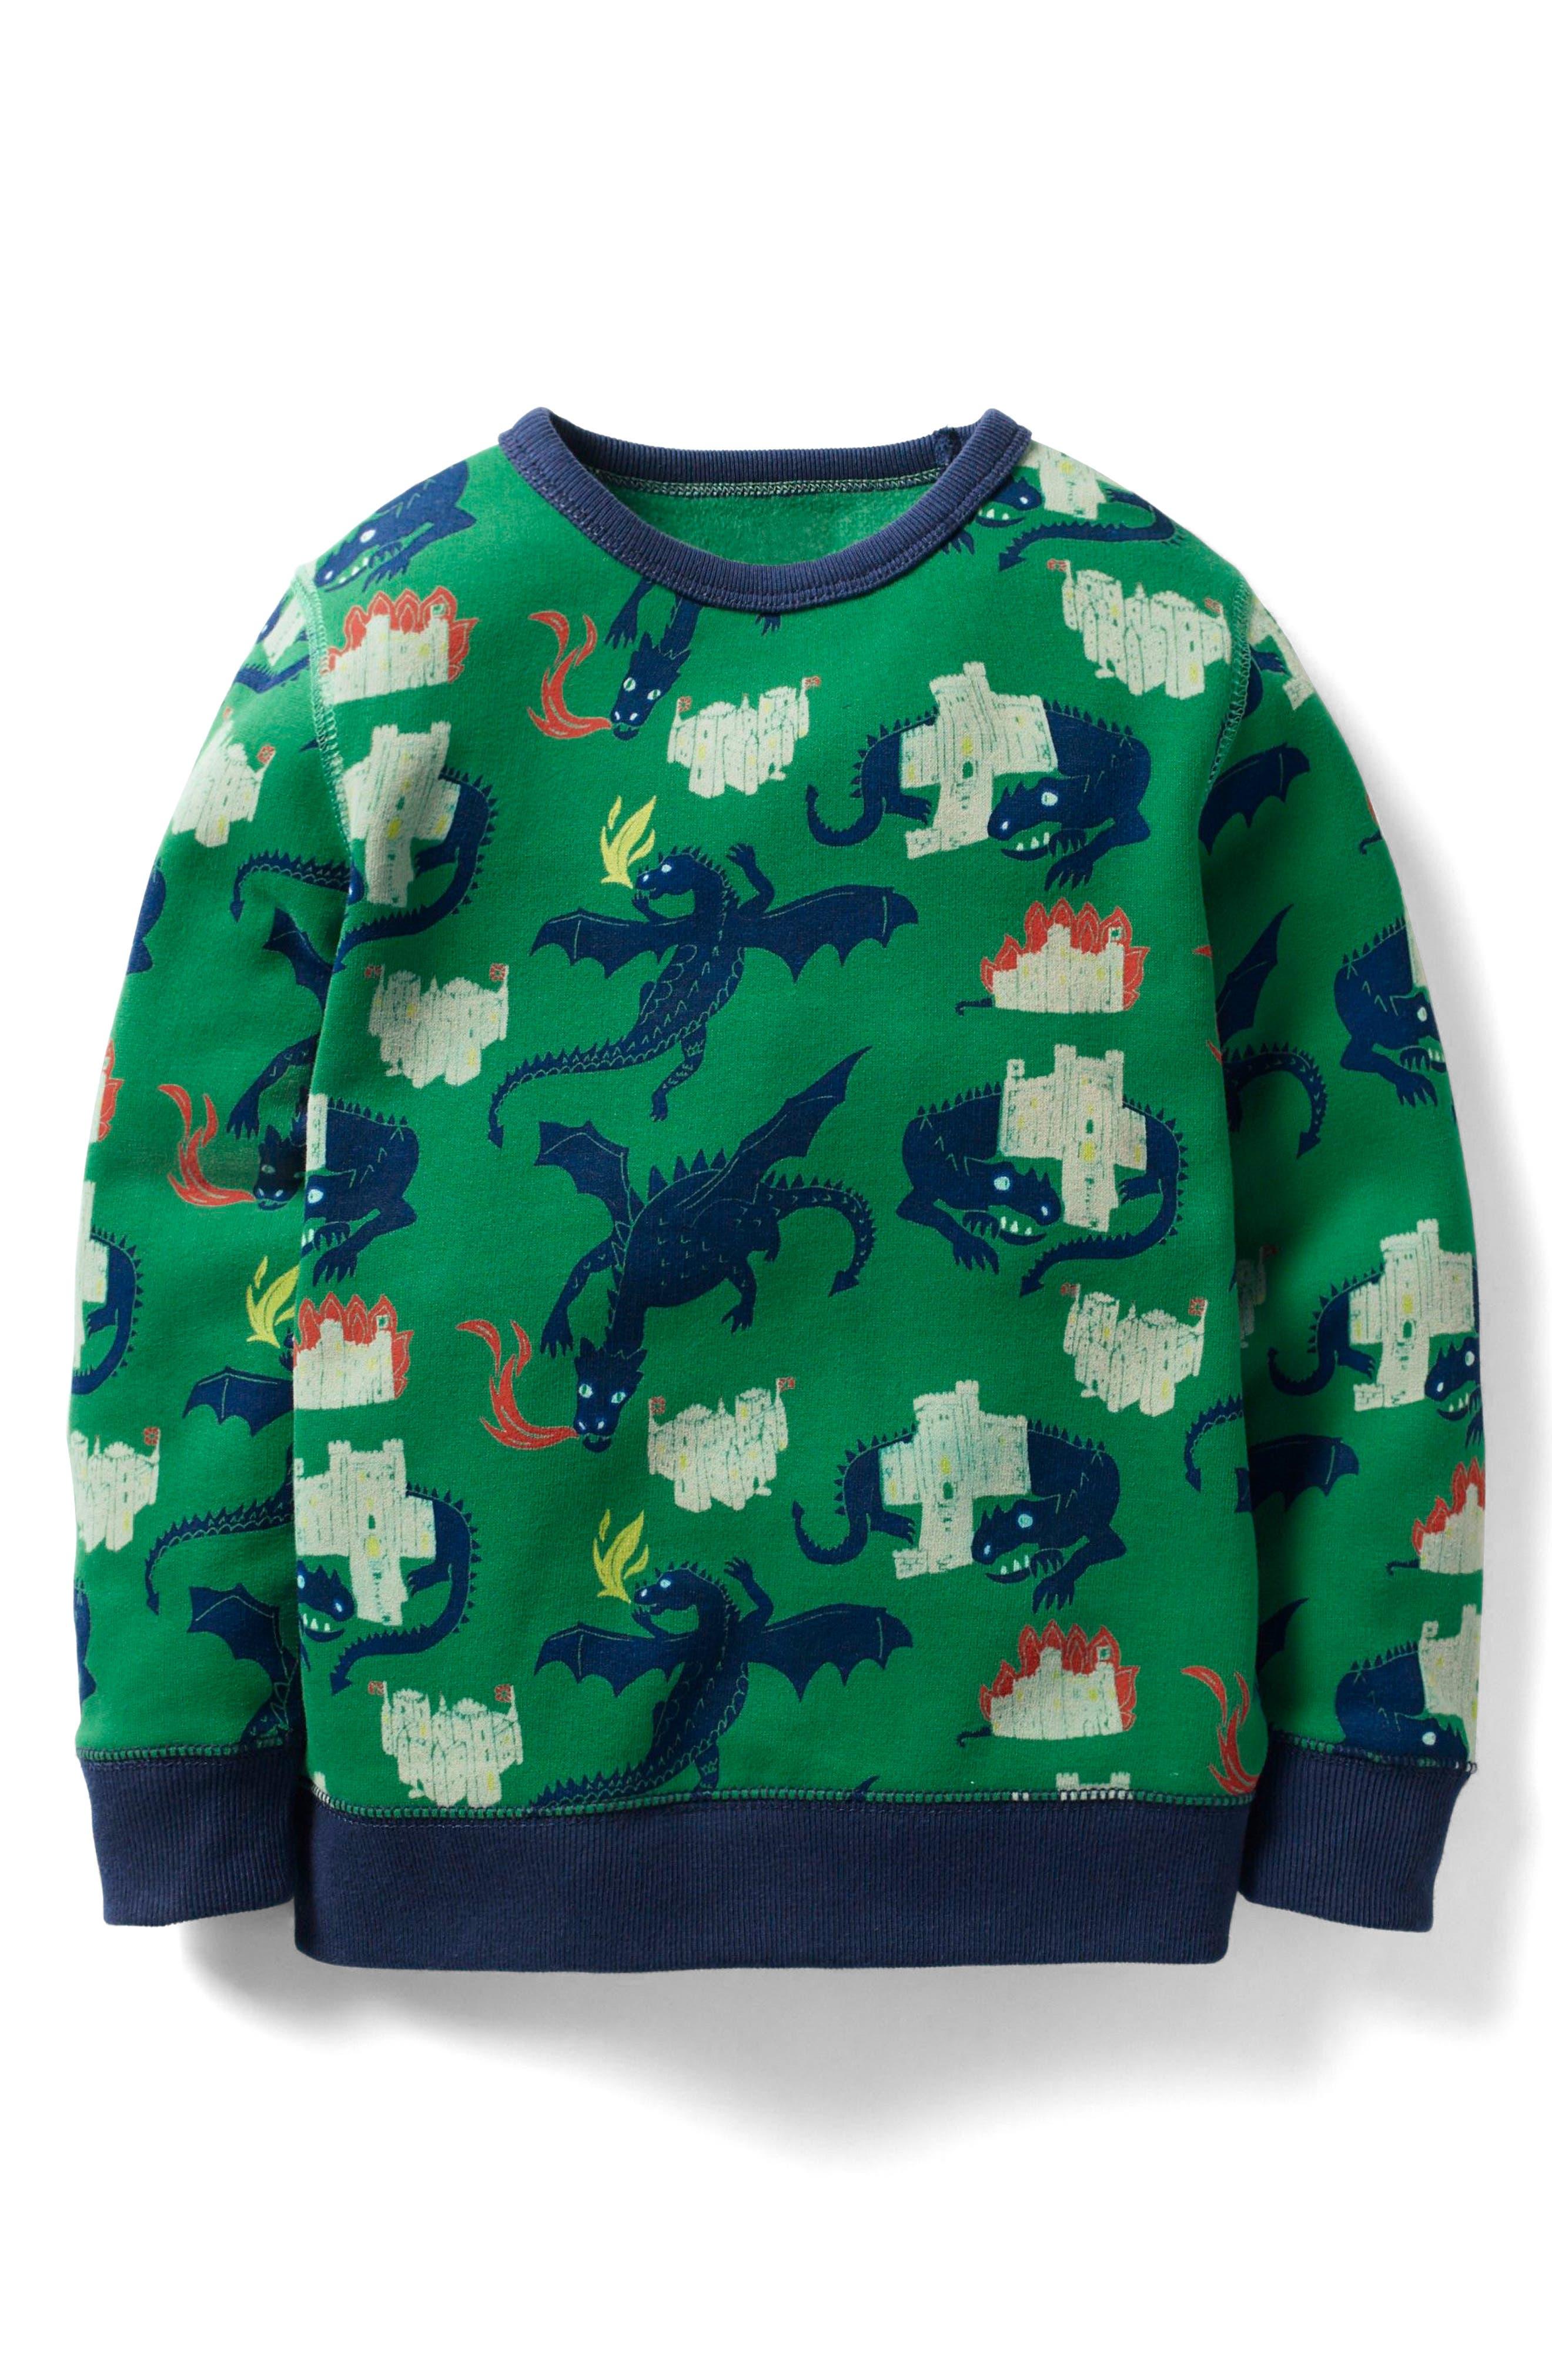 Hero's Tale Sweatshirt,                         Main,                         color, 315